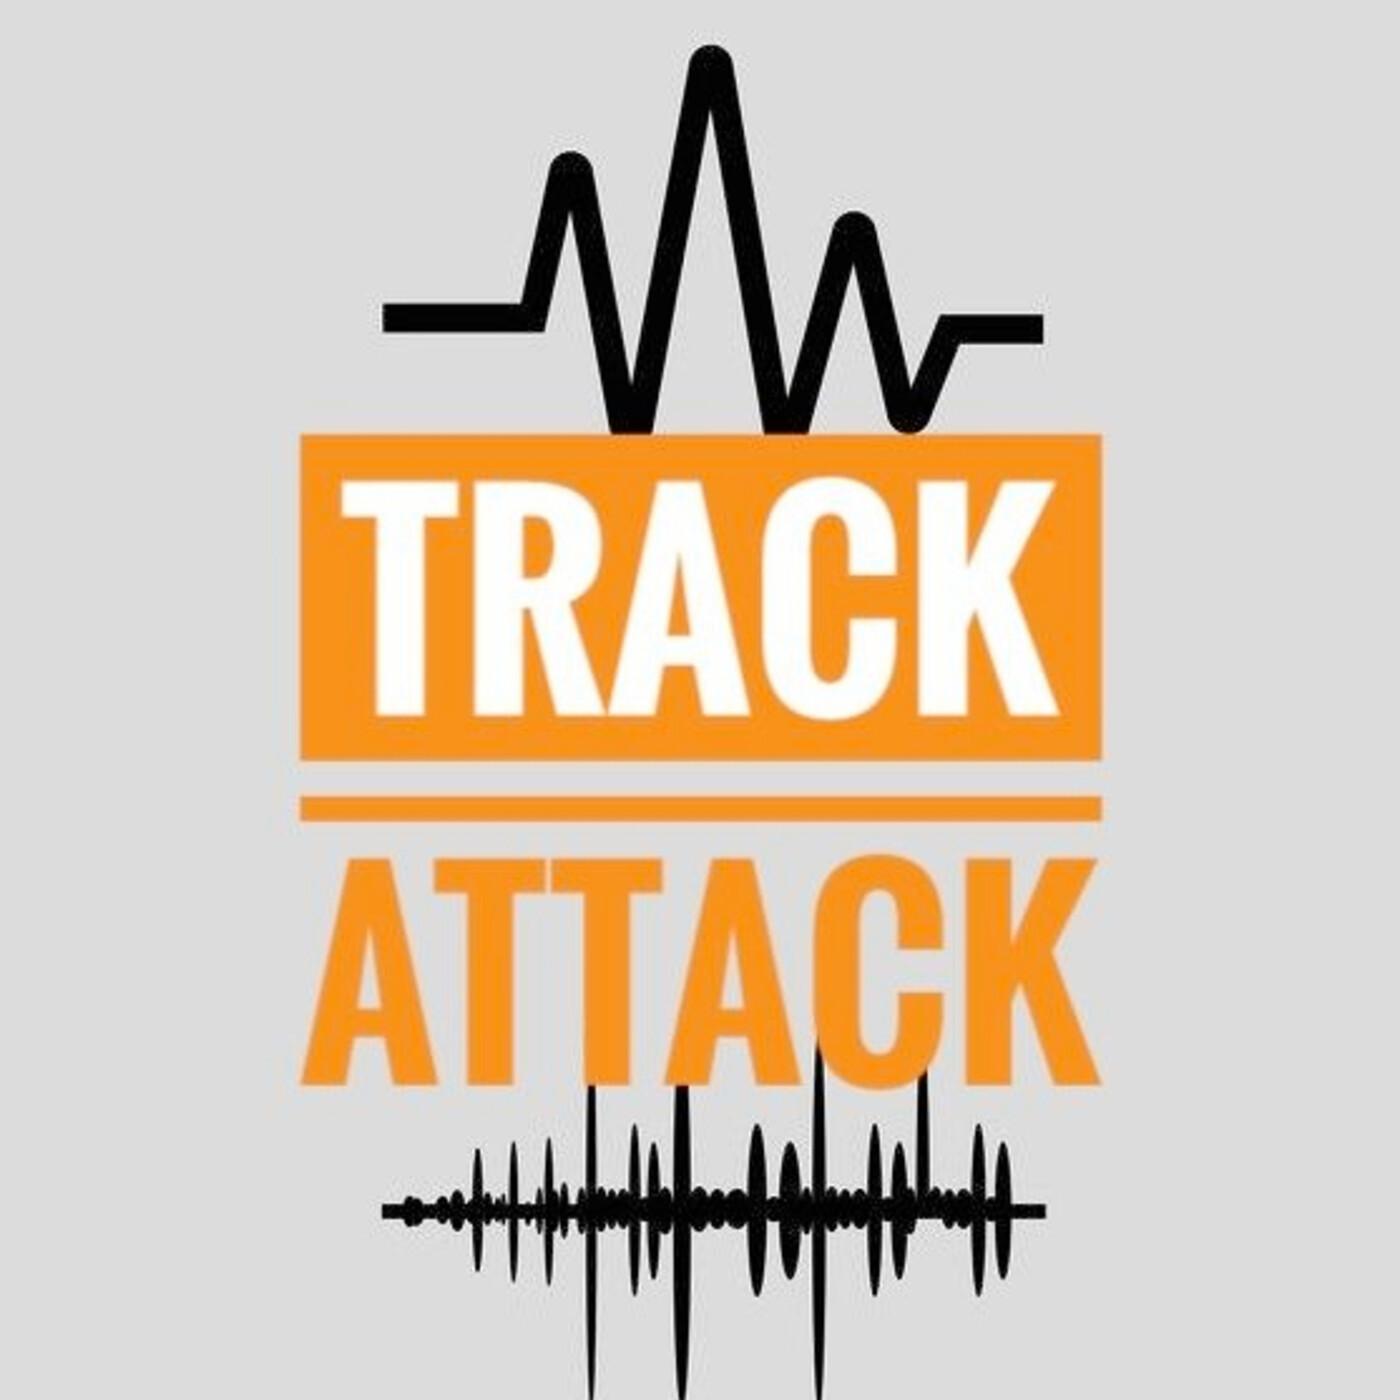 Track Attack 4 de Octubre 2020